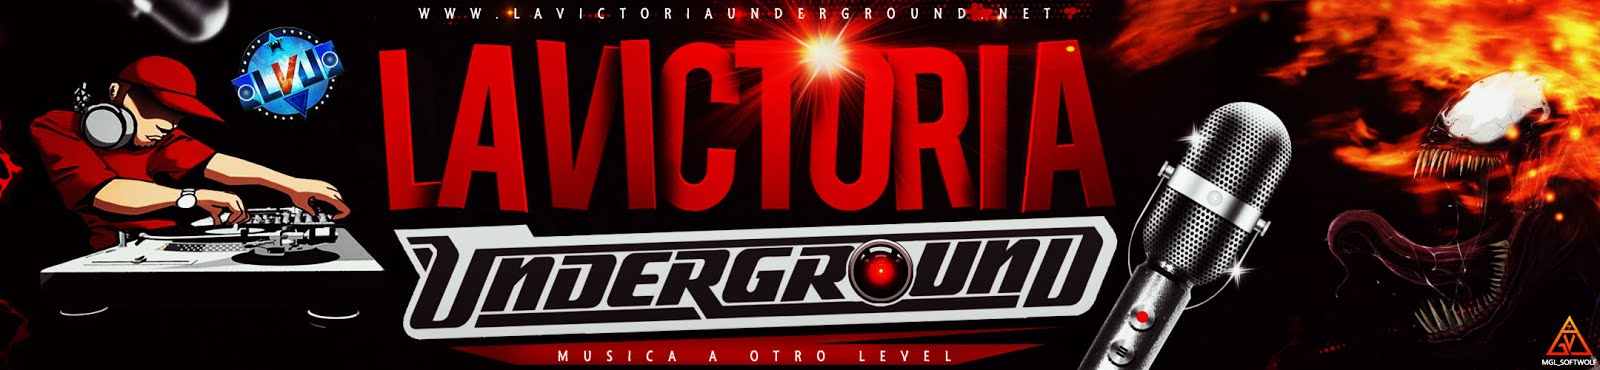 La Victoria Underground (LVU)